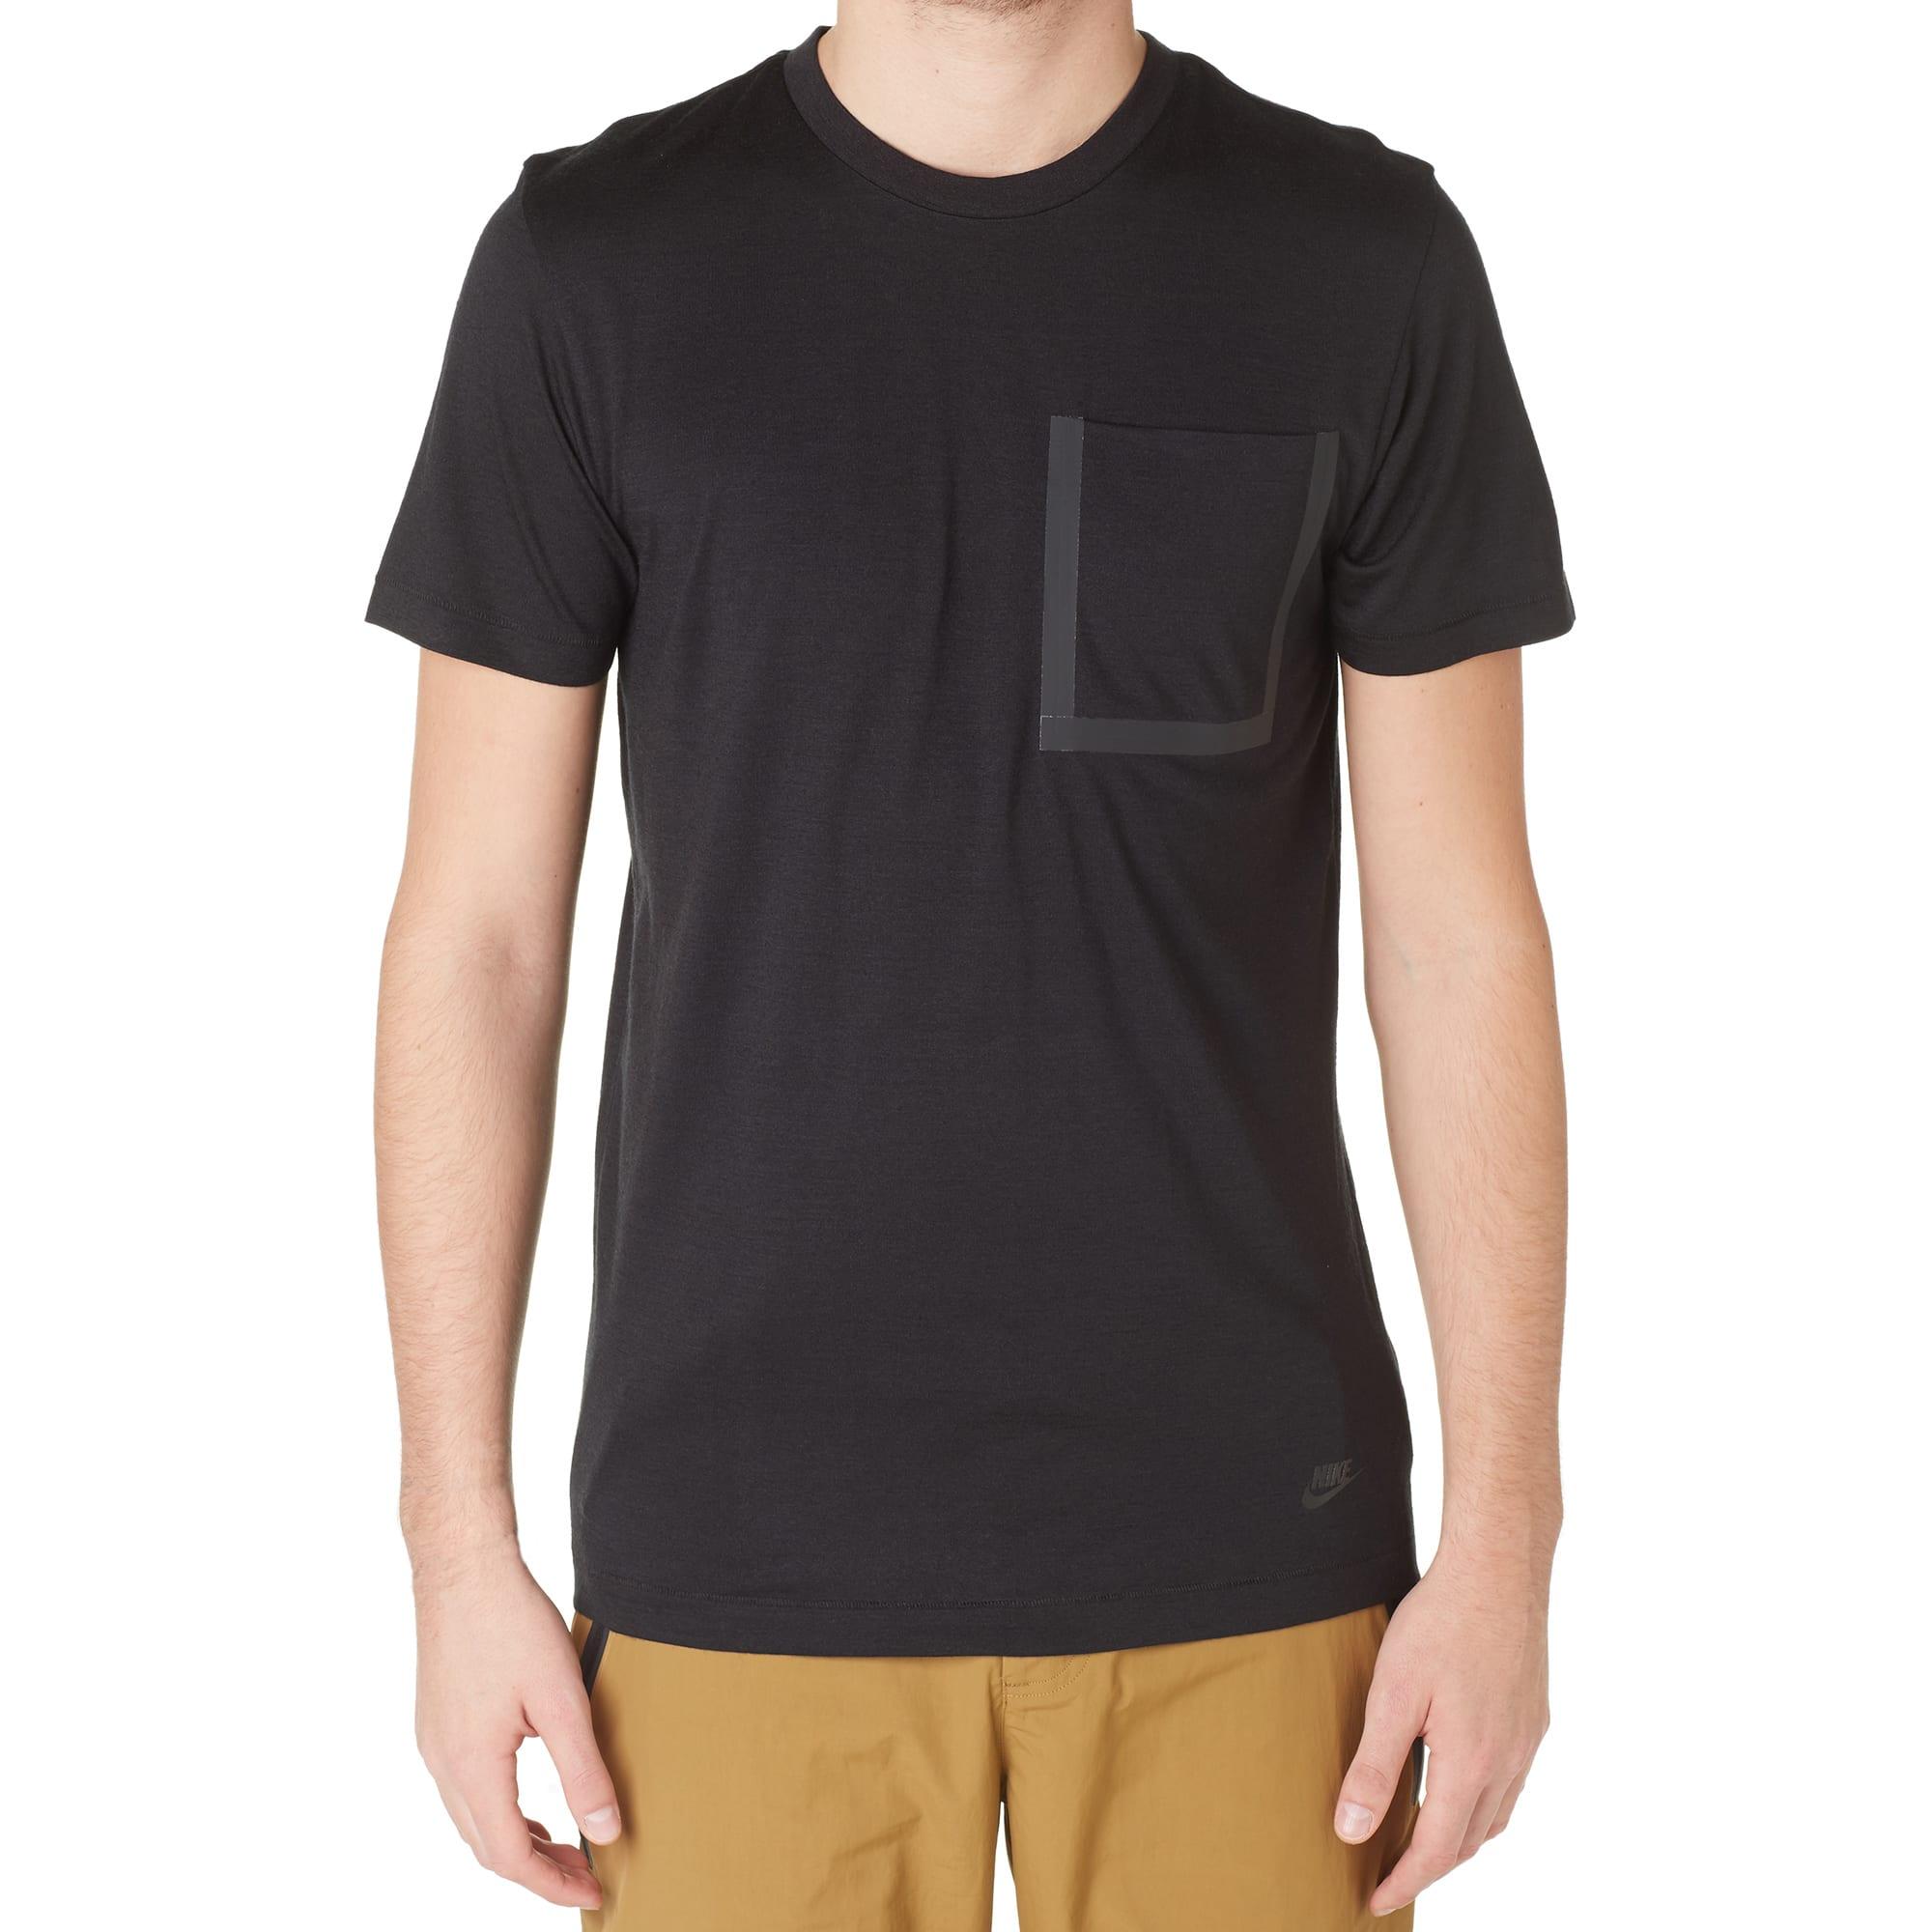 Nike White Label Pocket Tee (Black